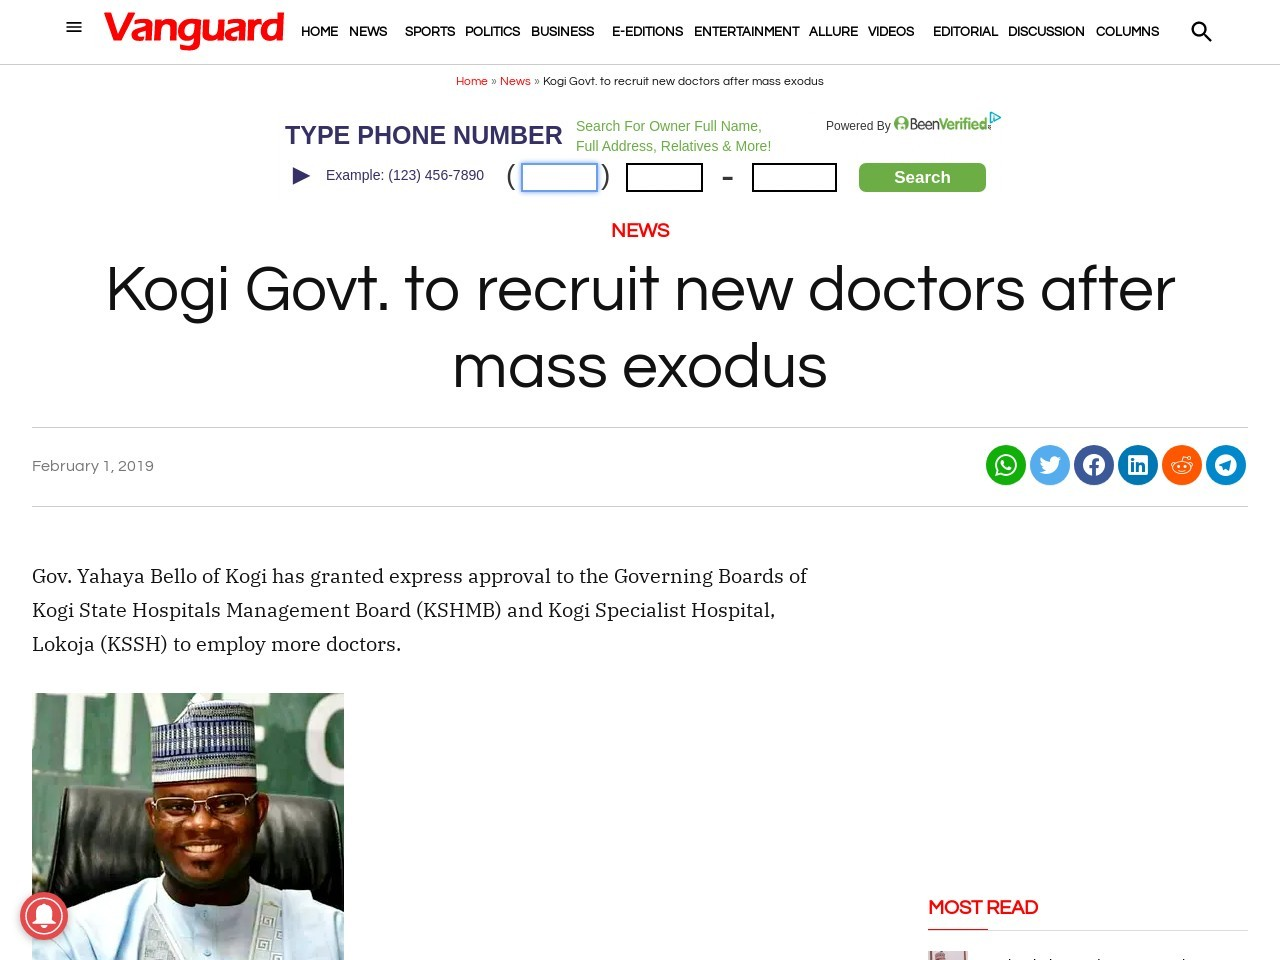 Kogi Govt. to recruit new doctors after mass exodus